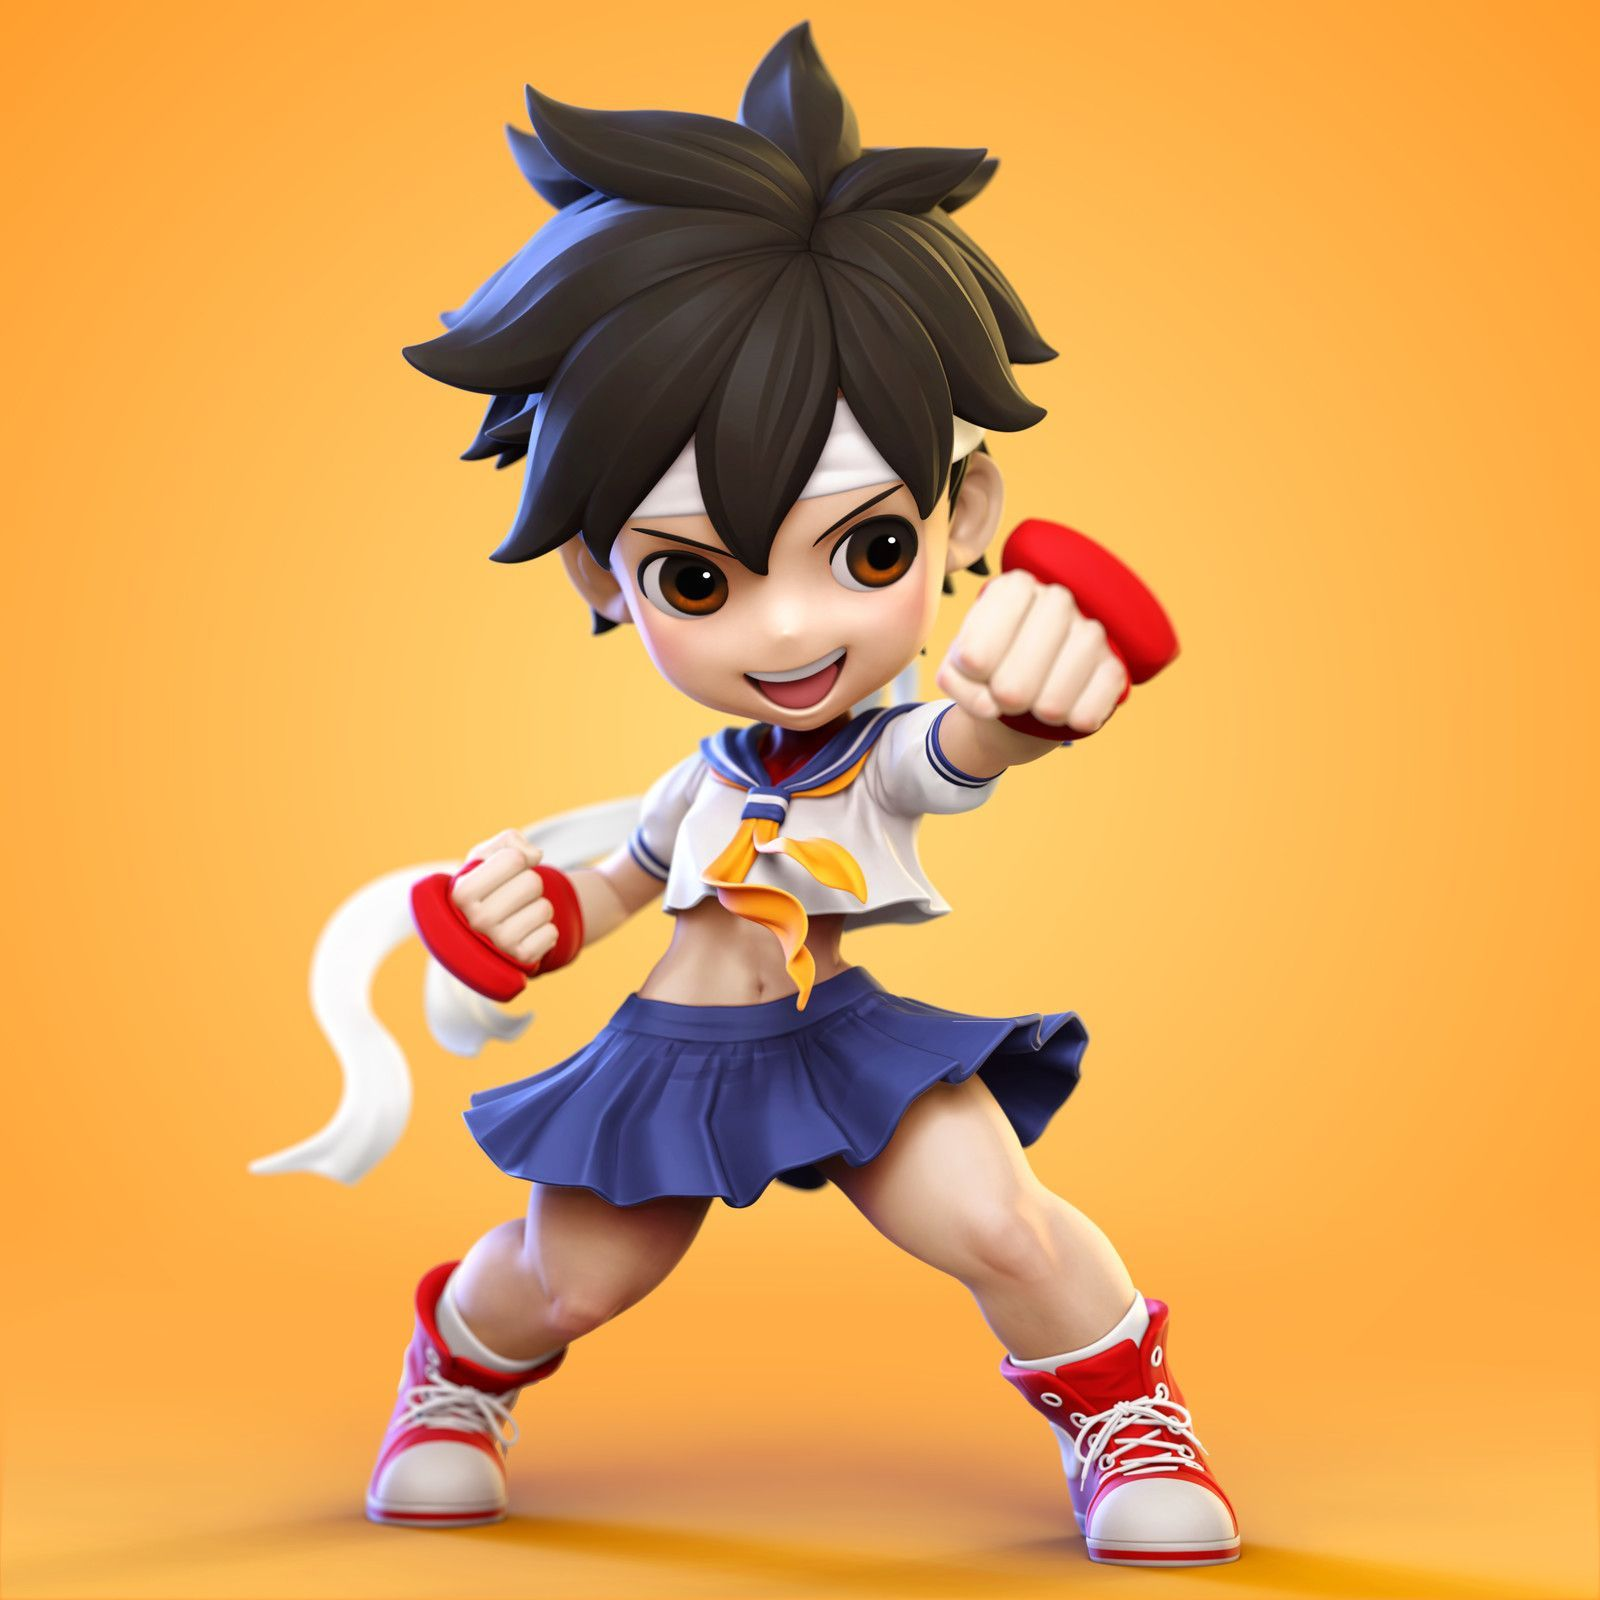 anime figure anime animefigure figurecollection